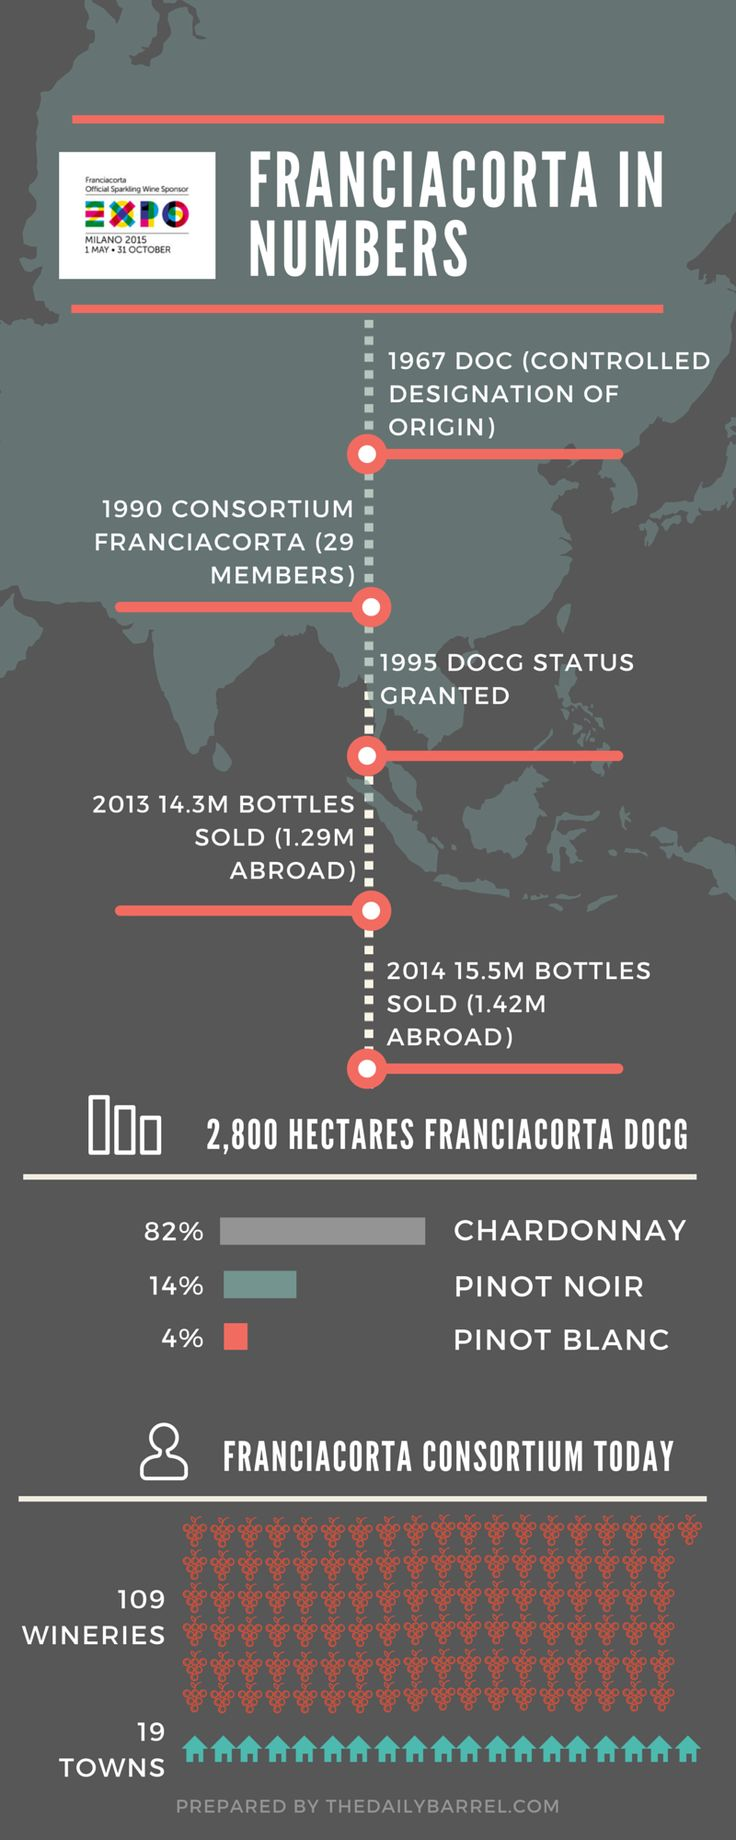 Franciacorta in Numbers - Understanding Italian Sparkling Wine